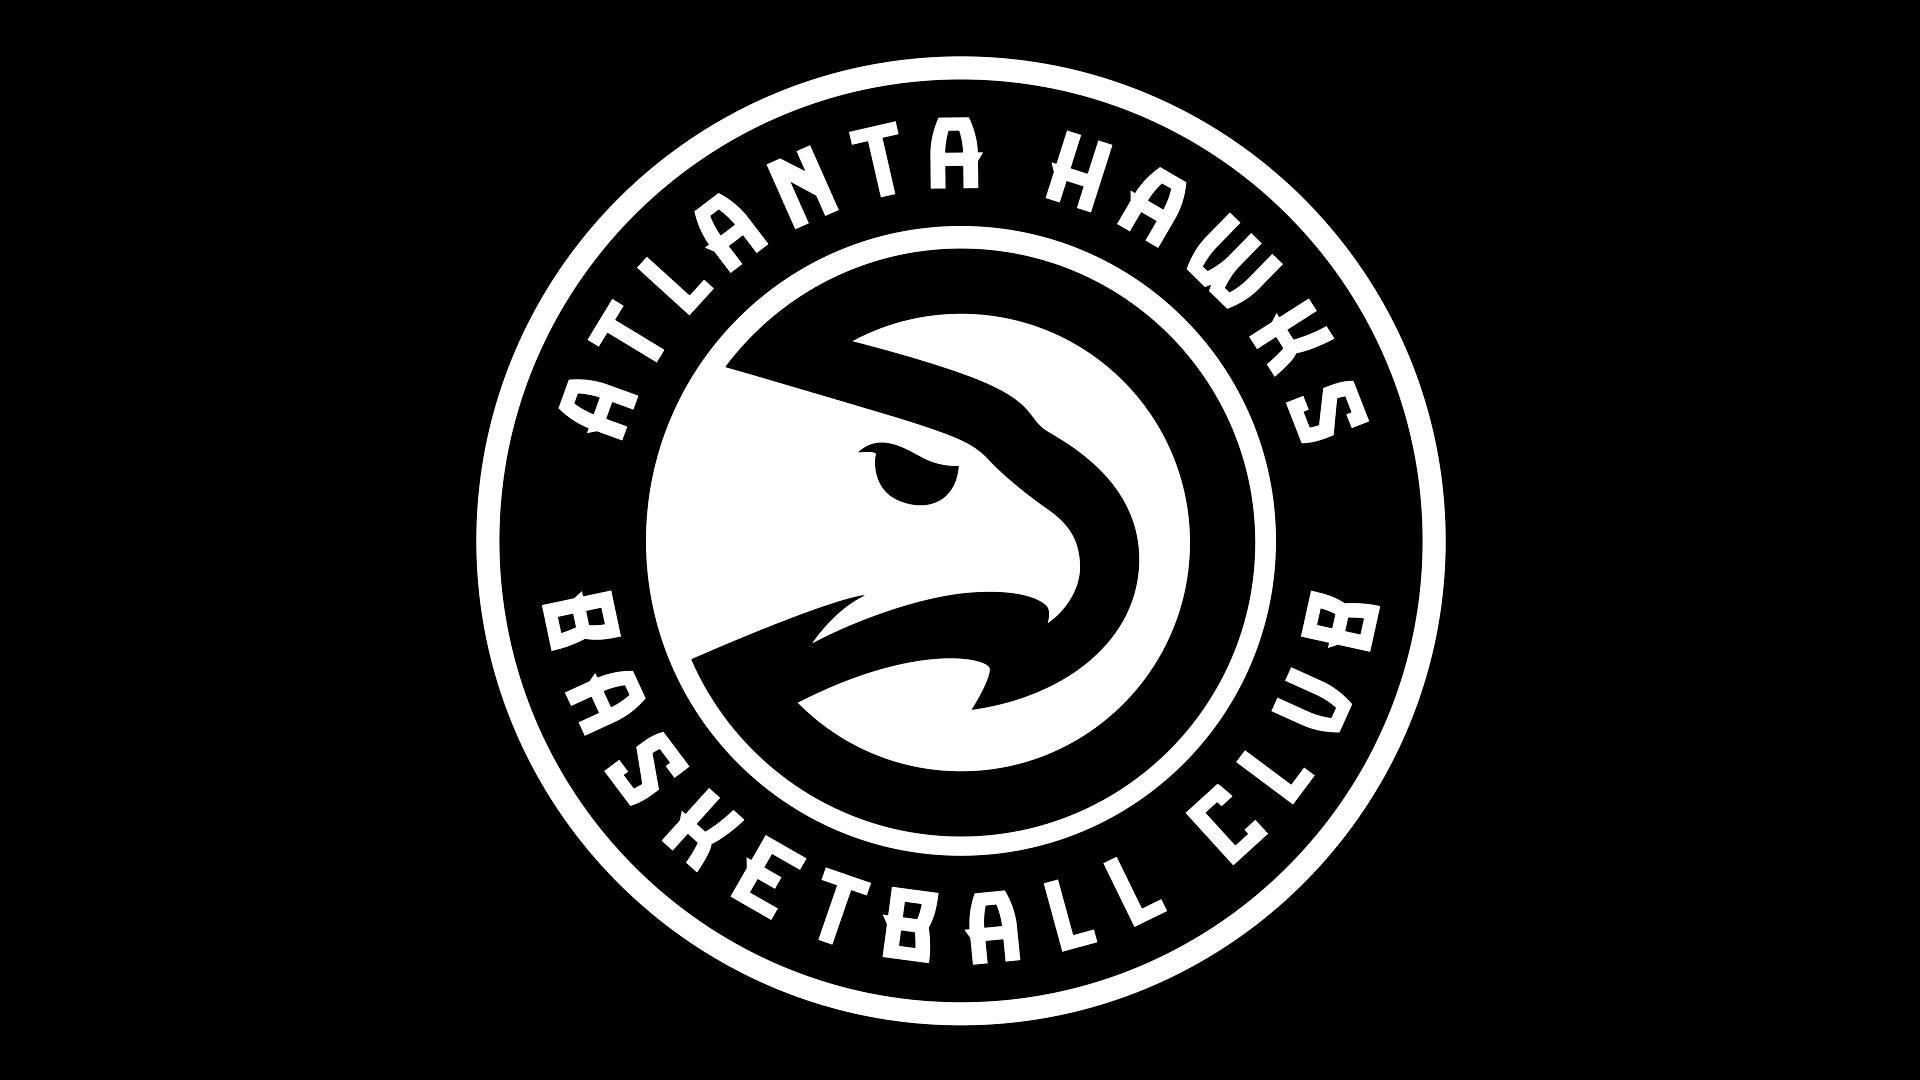 1920x1080 Atlanta Hawks Logo, Atlanta Hawks Symbol, Meaning, History